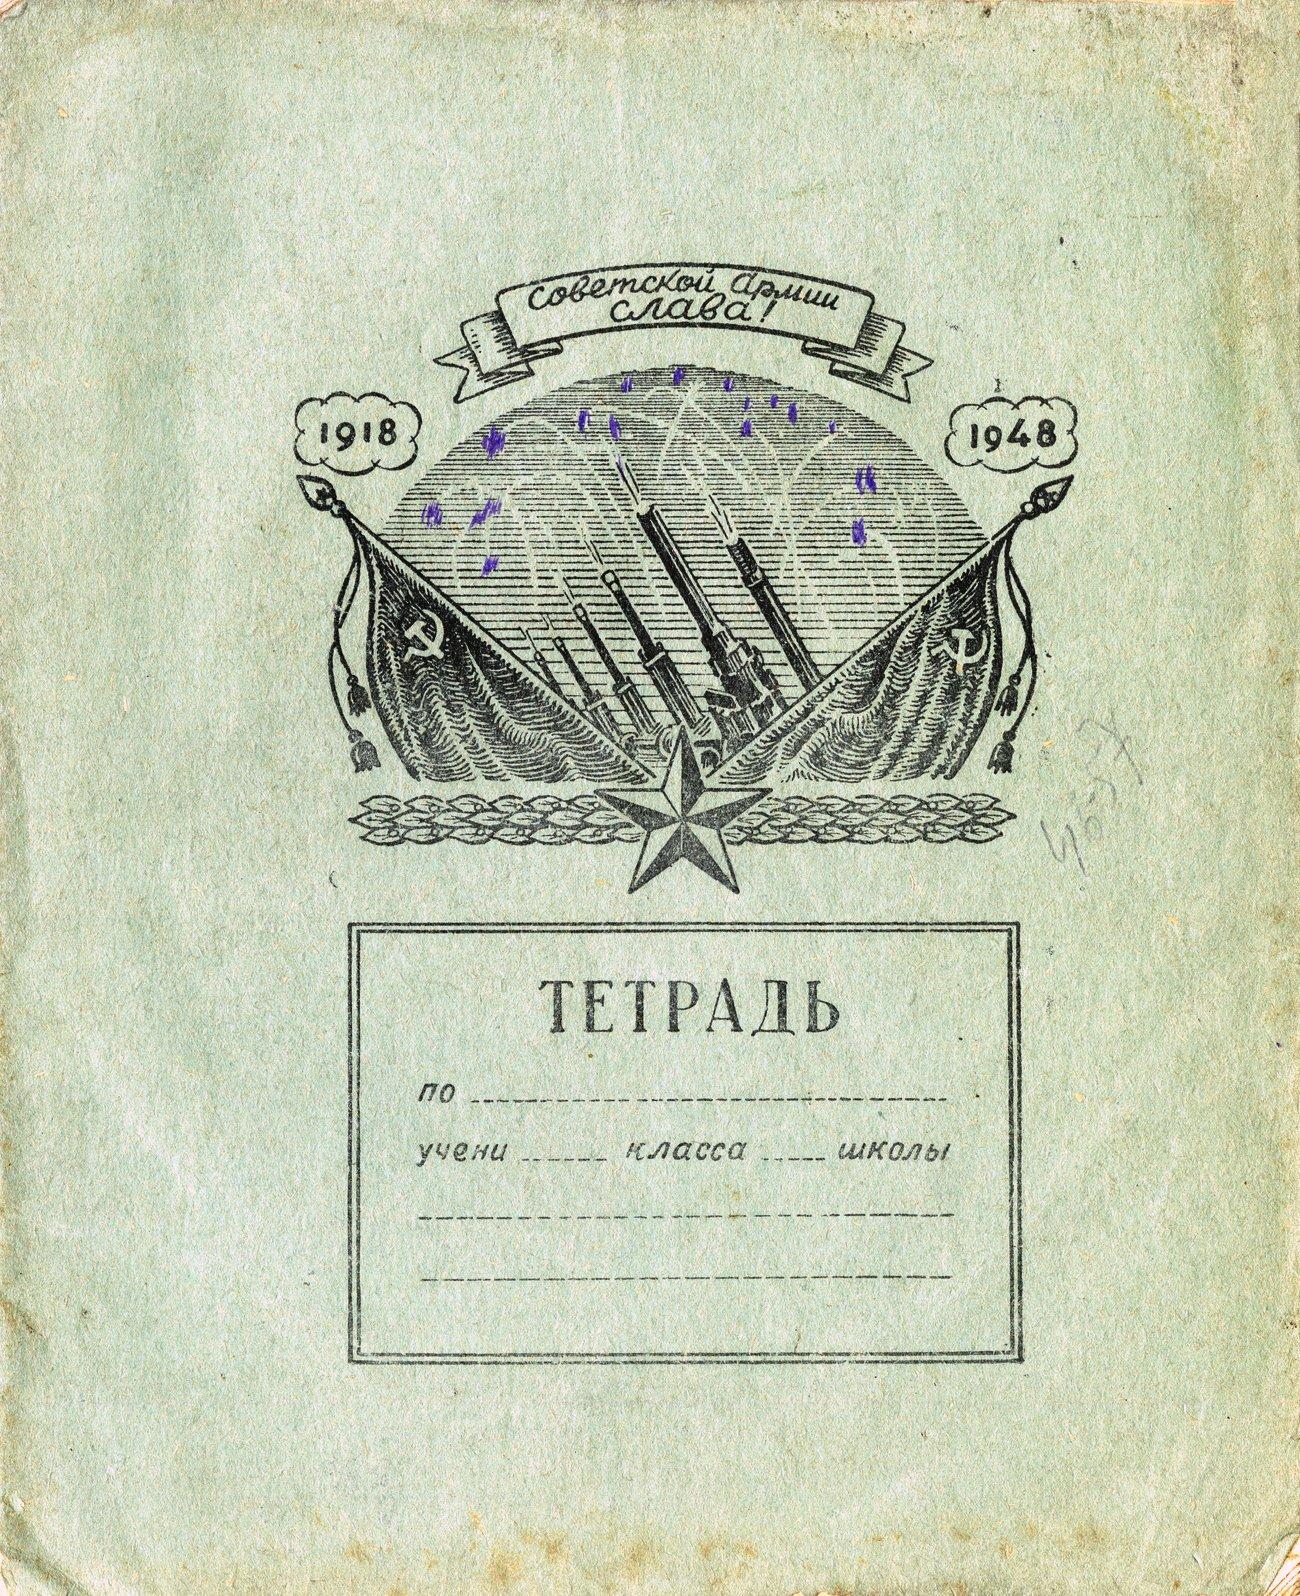 Тетрадь 30 лет Советской армии, 170х205